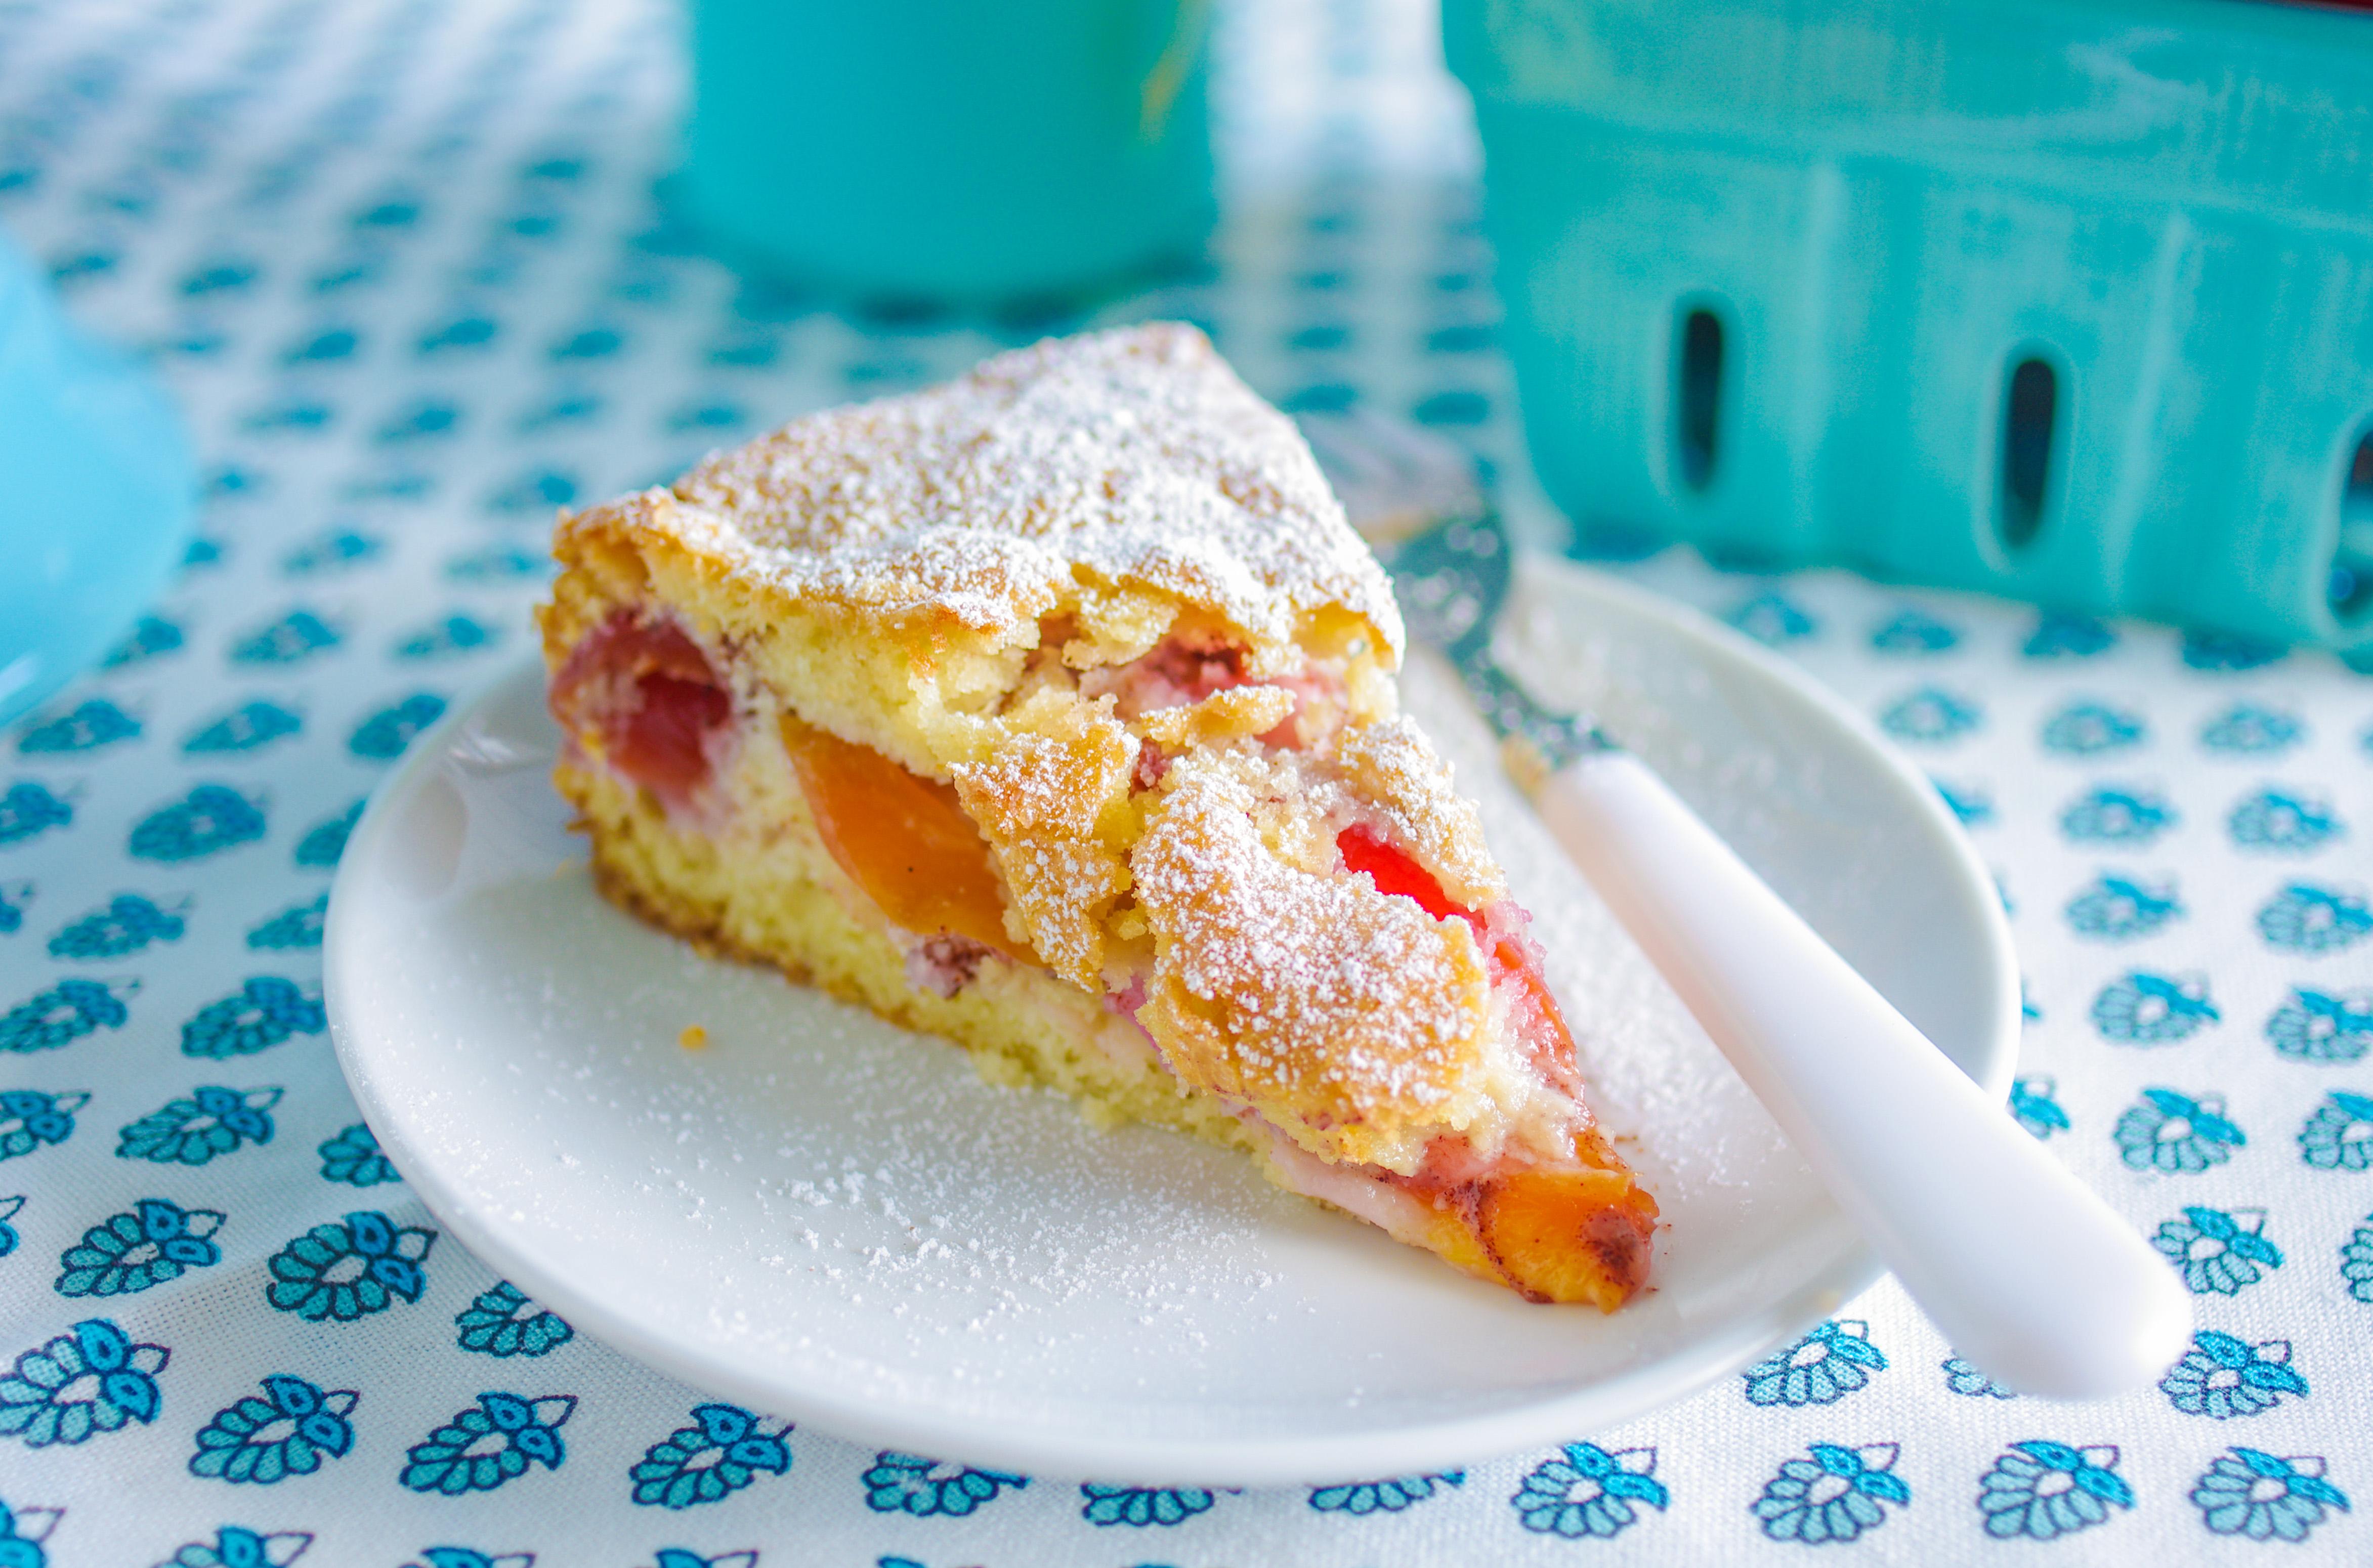 Recipe: A simple summer cake sandwiches ripe nectarines in a buttermilk batter